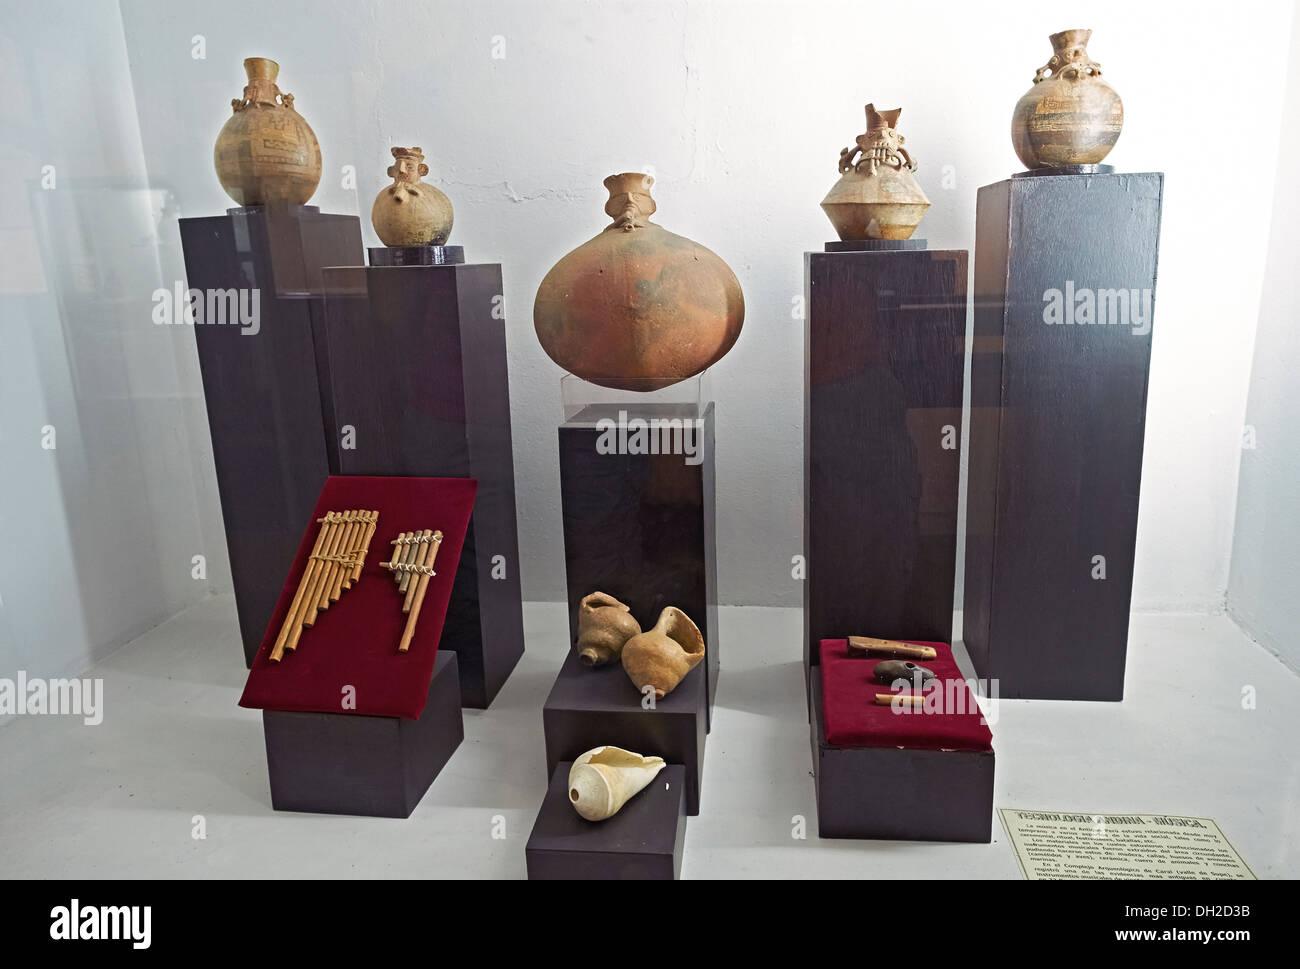 Artifacts at the Archeology Museum of Ancash,Huaraz, Peru. - Stock Image